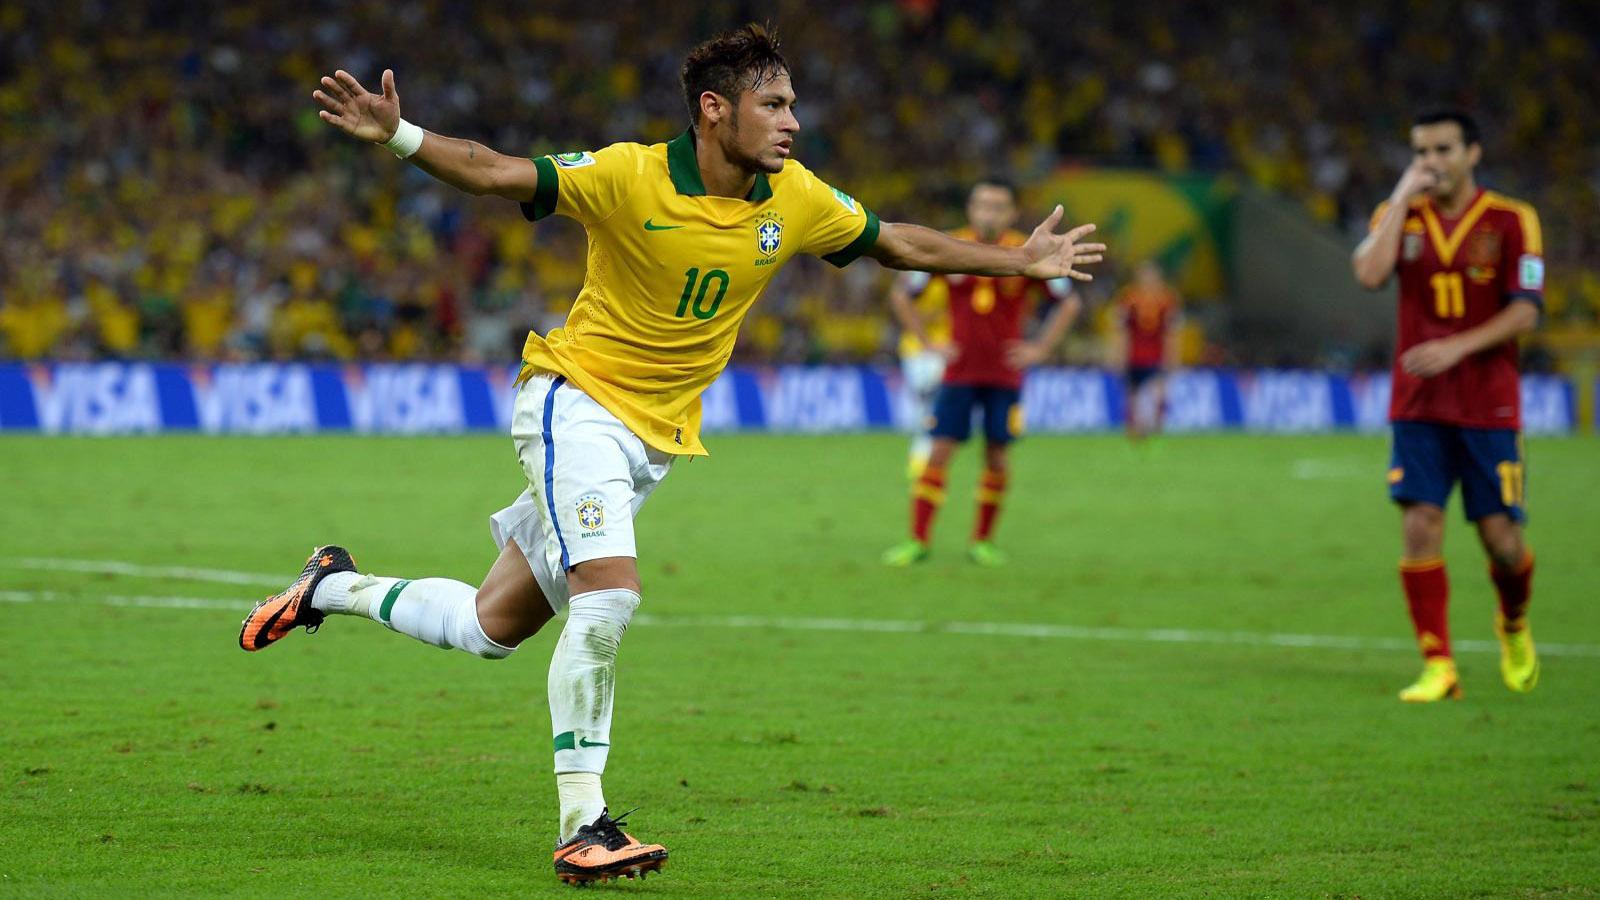 Neymar Cool On Brazil Football Club Wallpaper 13252 Wallpaper High 1600x900